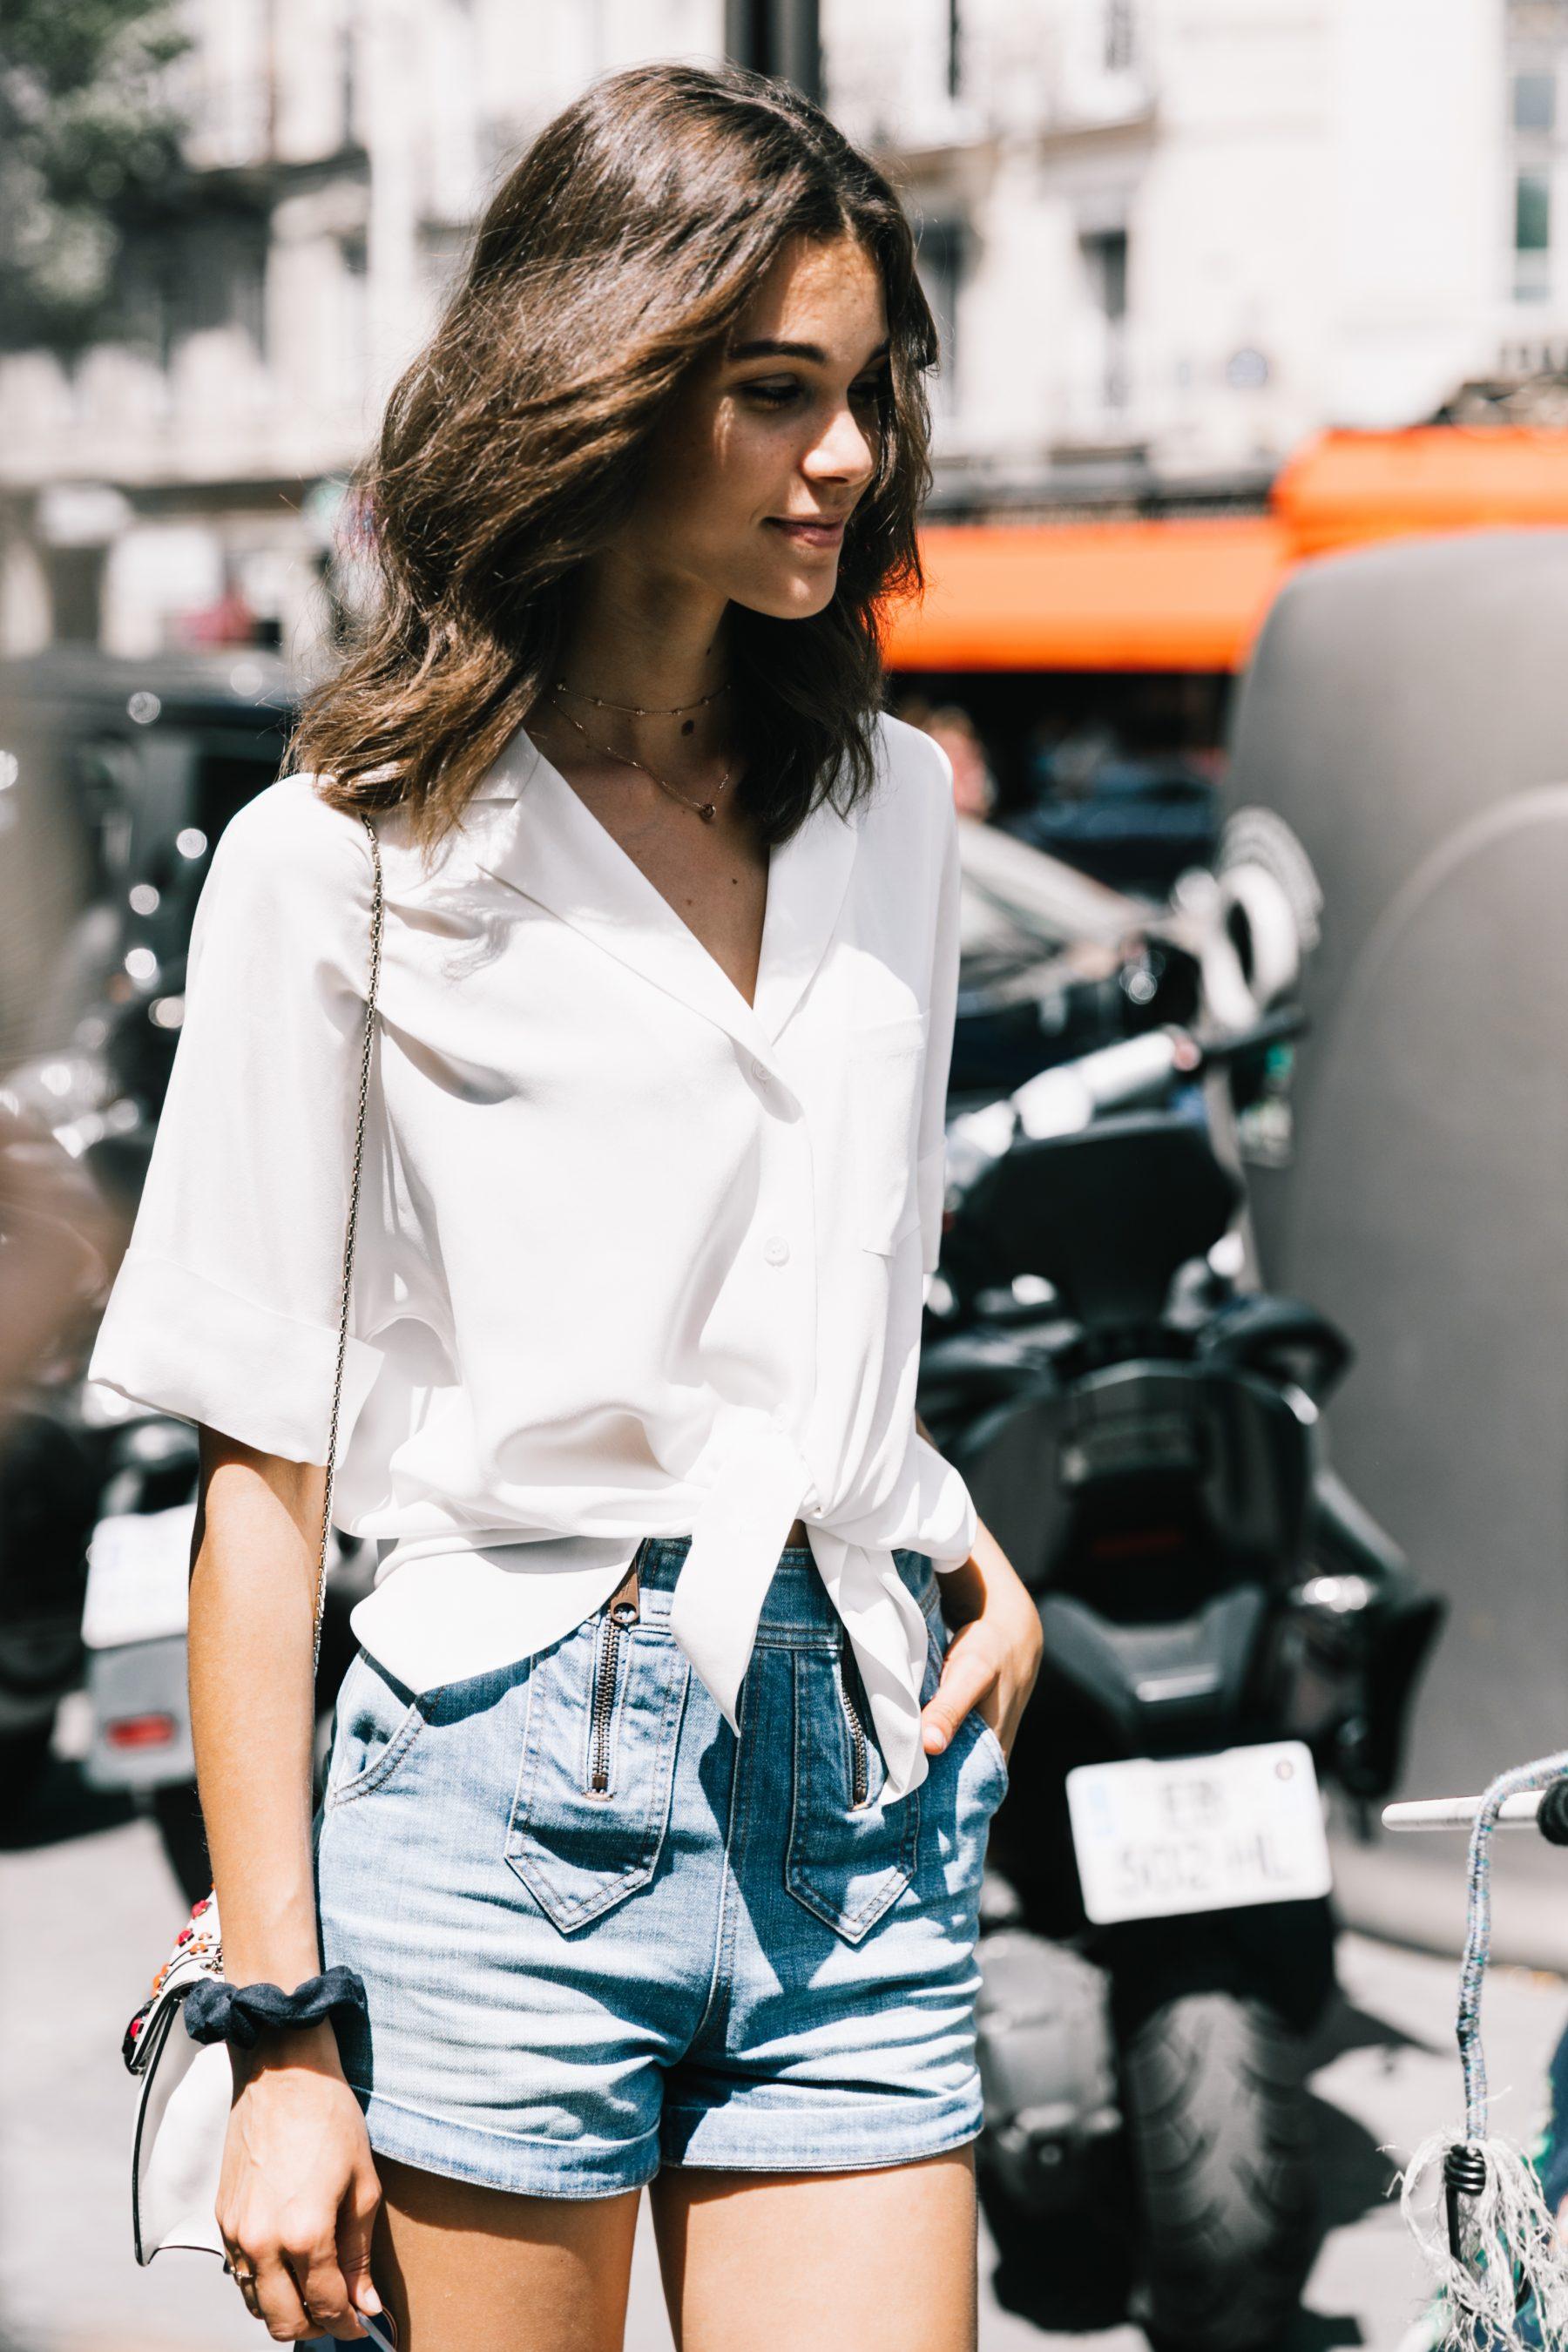 PFW-Paris_Fashion_Week_Haute_Couture-Street_Style-Collage_Vintage-56-1800x2700.jpg